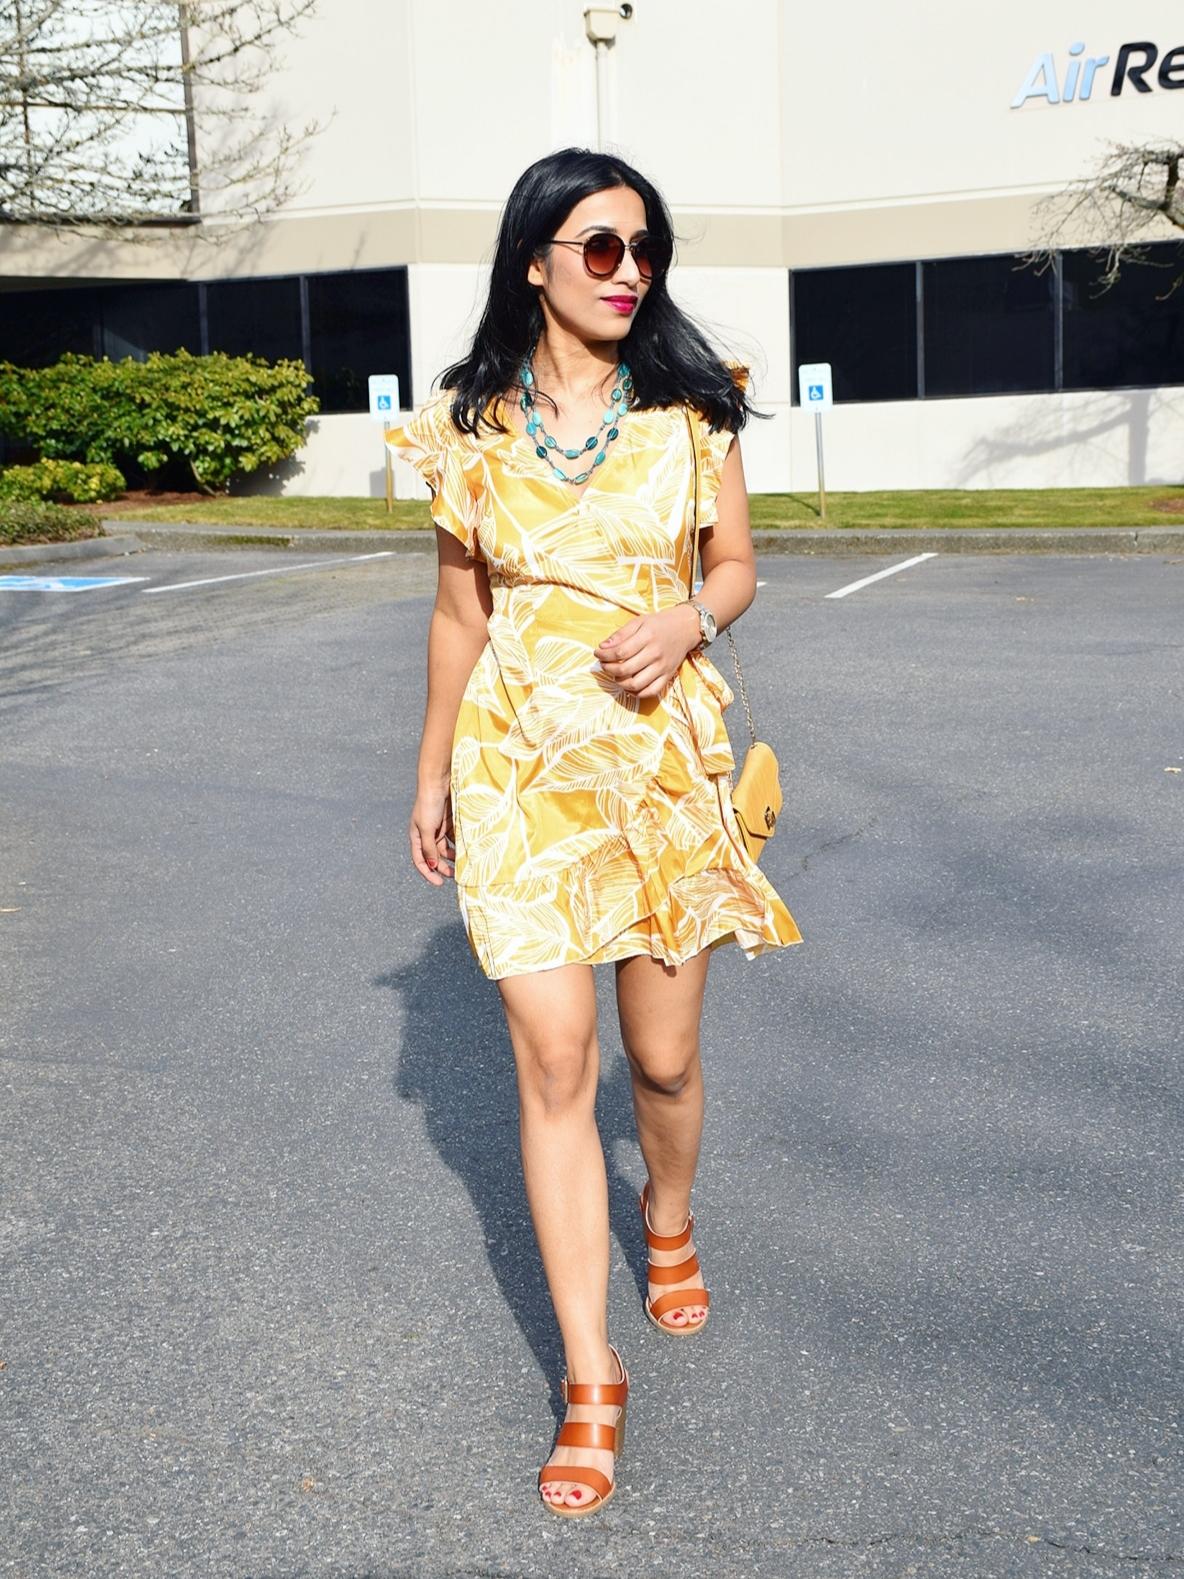 https://www.dropship-clothes.com/Mustard-Leaf-Vein-Print-Ruffle-and-Wrap-Short-Summer-Dress-p499924.html